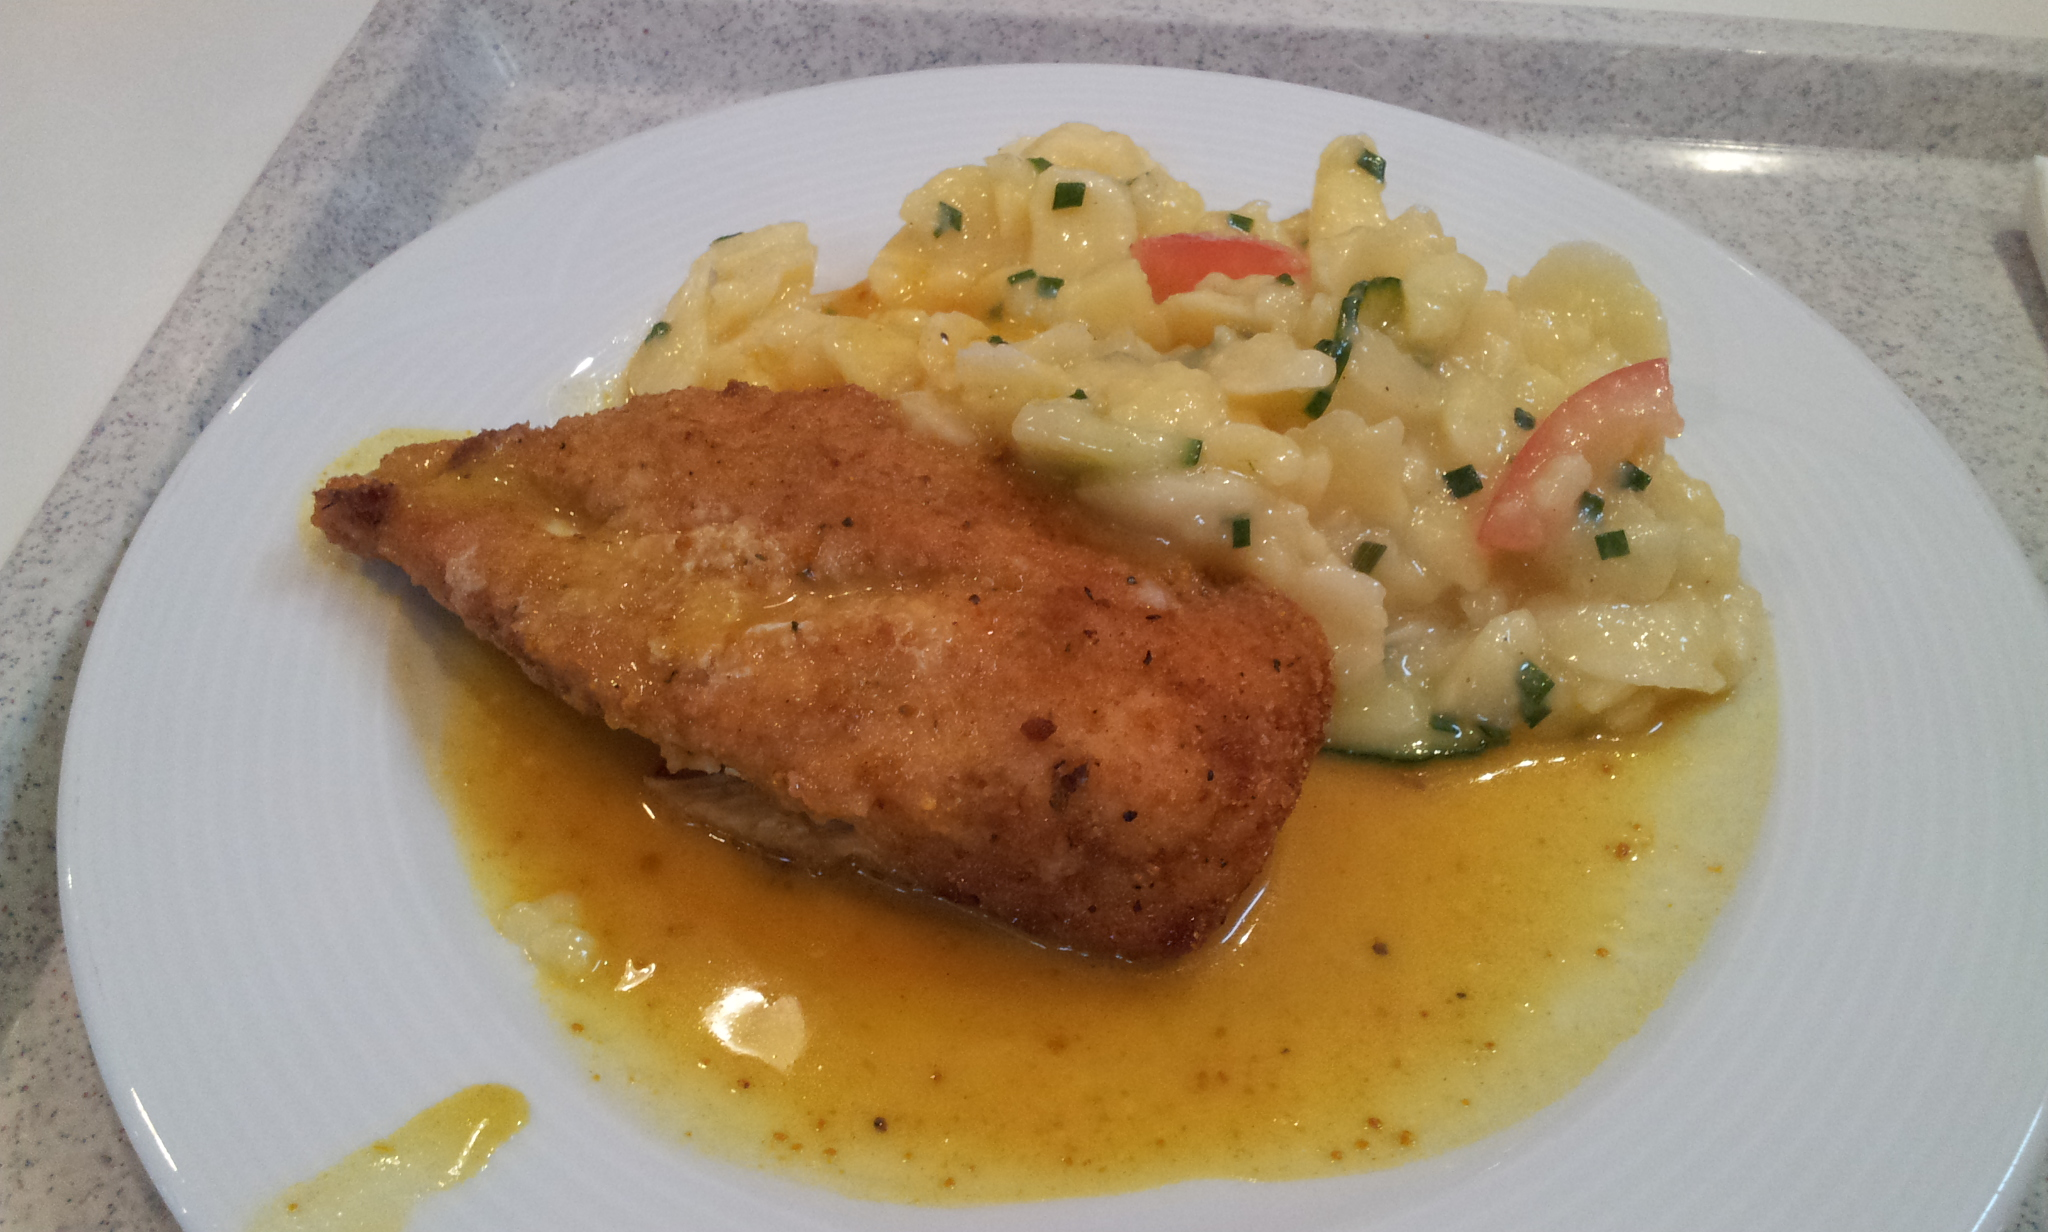 https://foodloader.net/Holz_2013-10-28_Haehnchenbrust_mit_Kartoffel-Cocktail.jpg